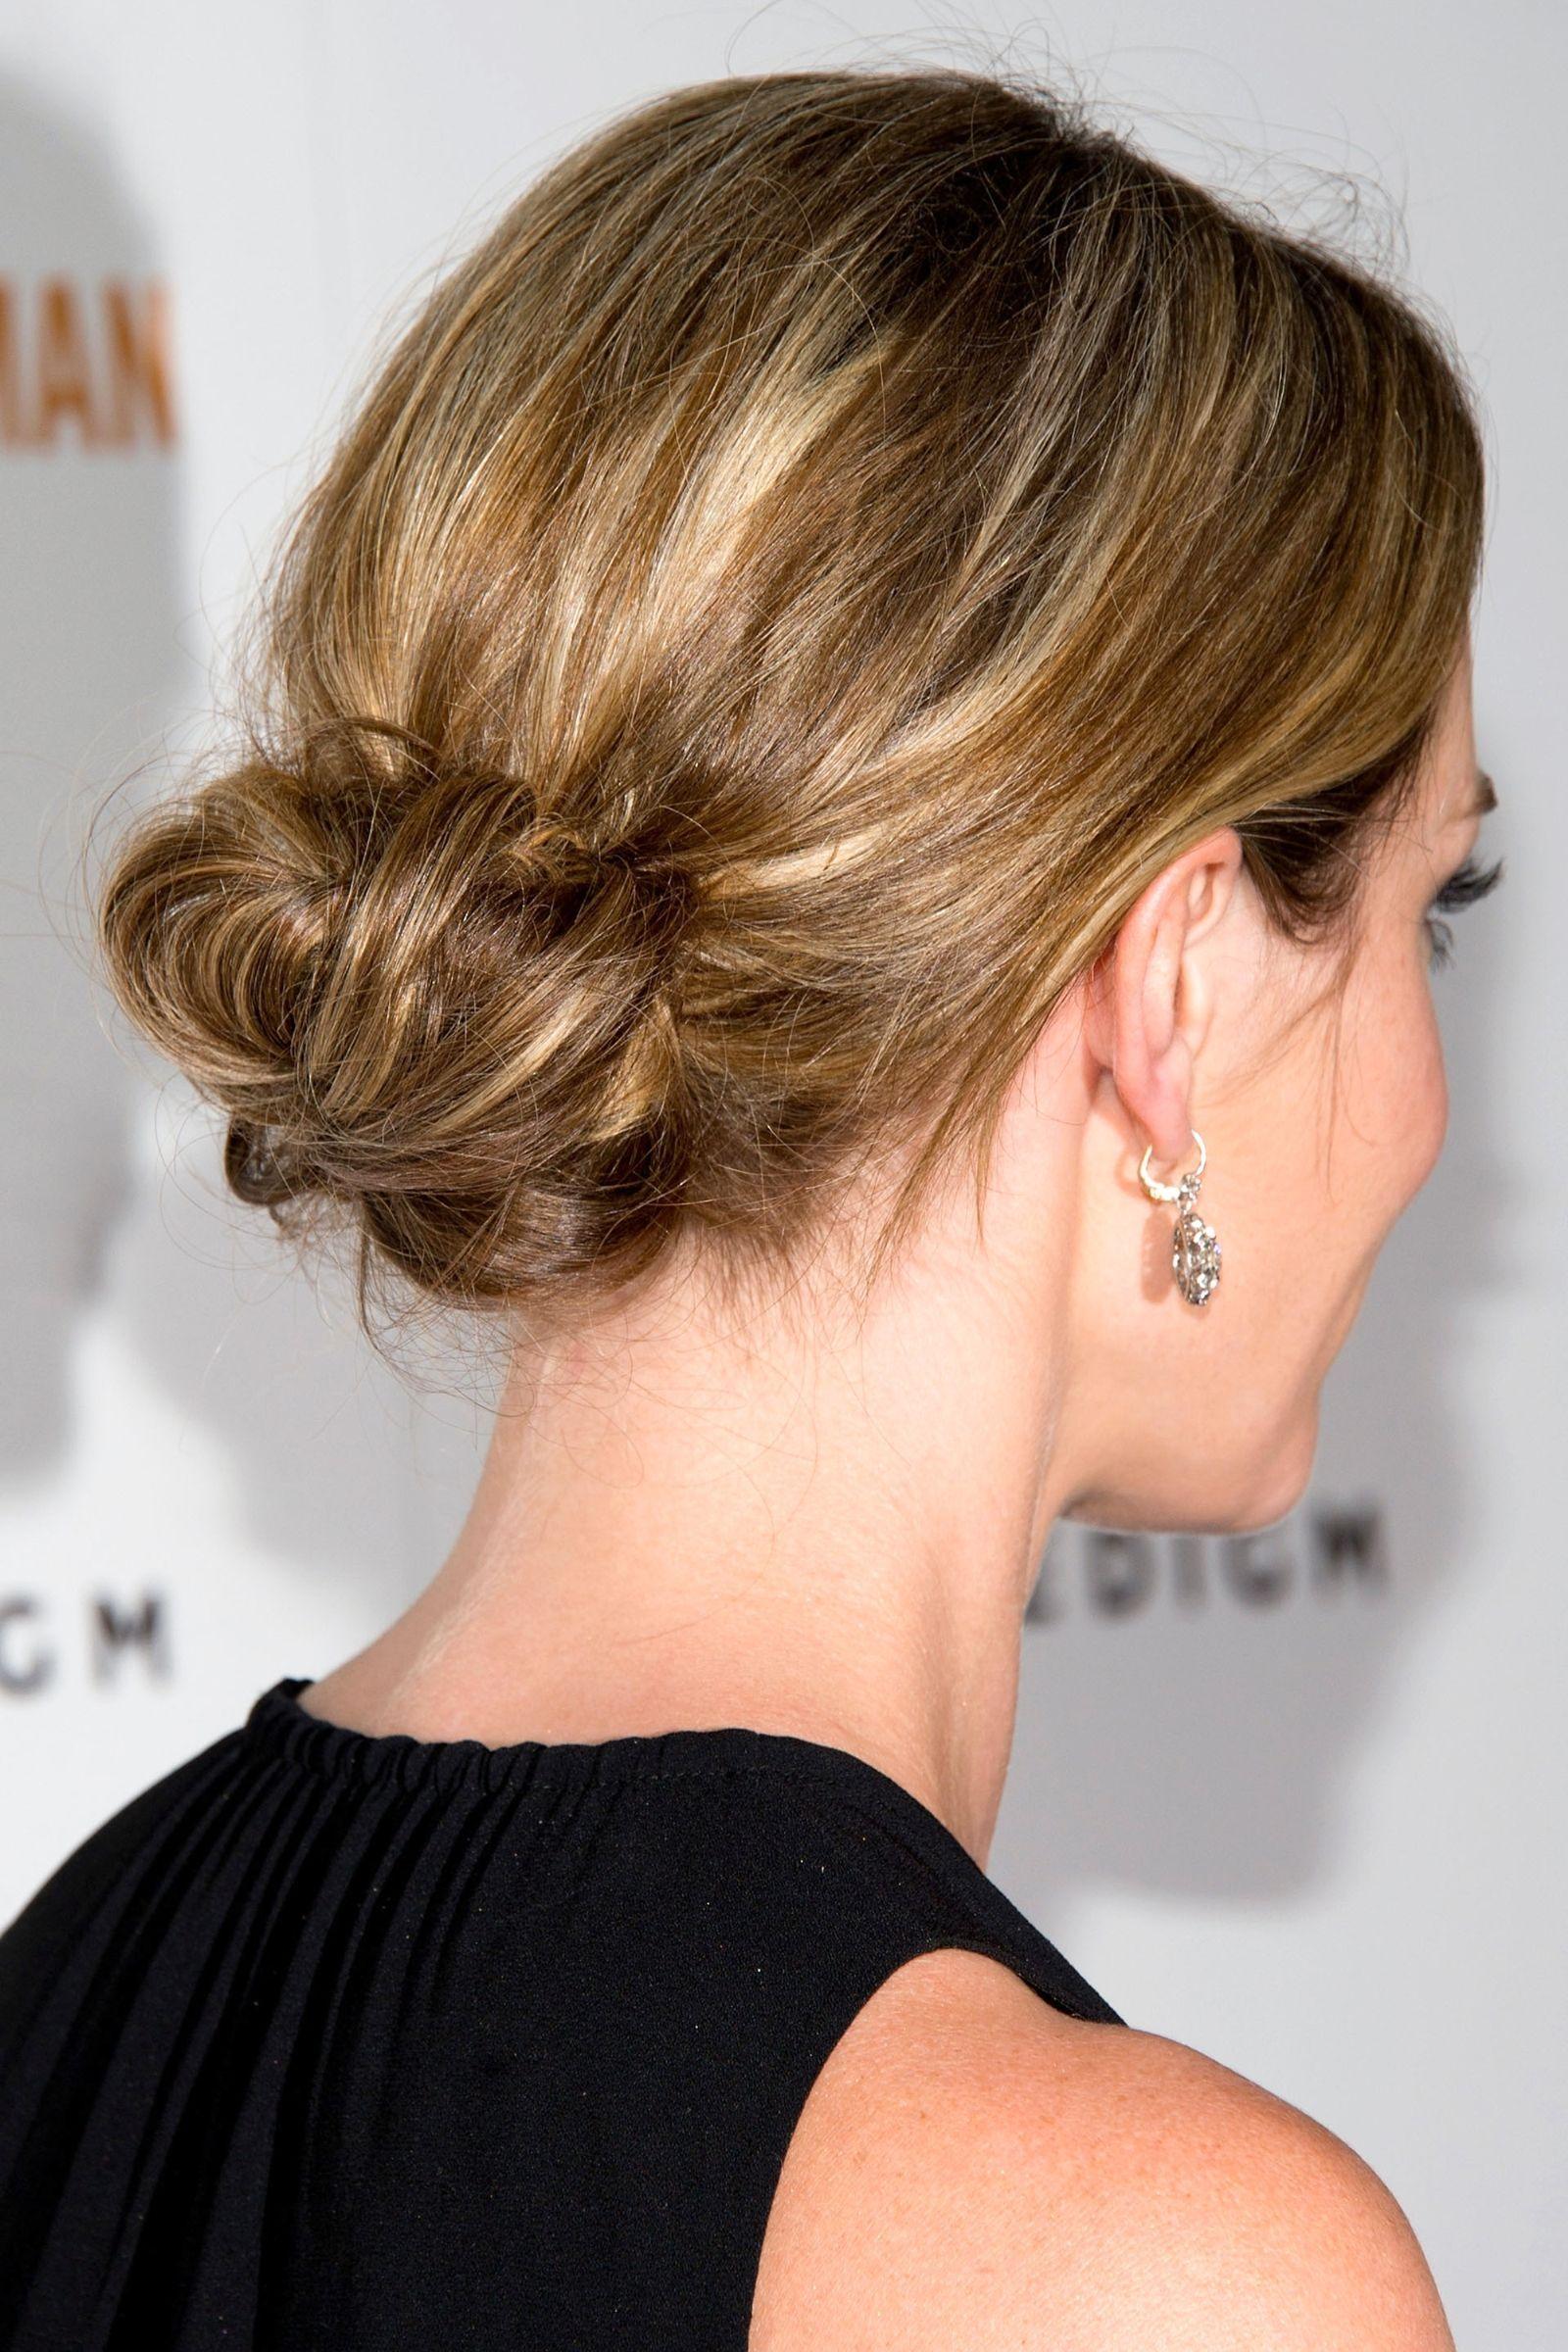 12 Of The Best Dark Blonde Hair Colors Pinterest Emily Blunt